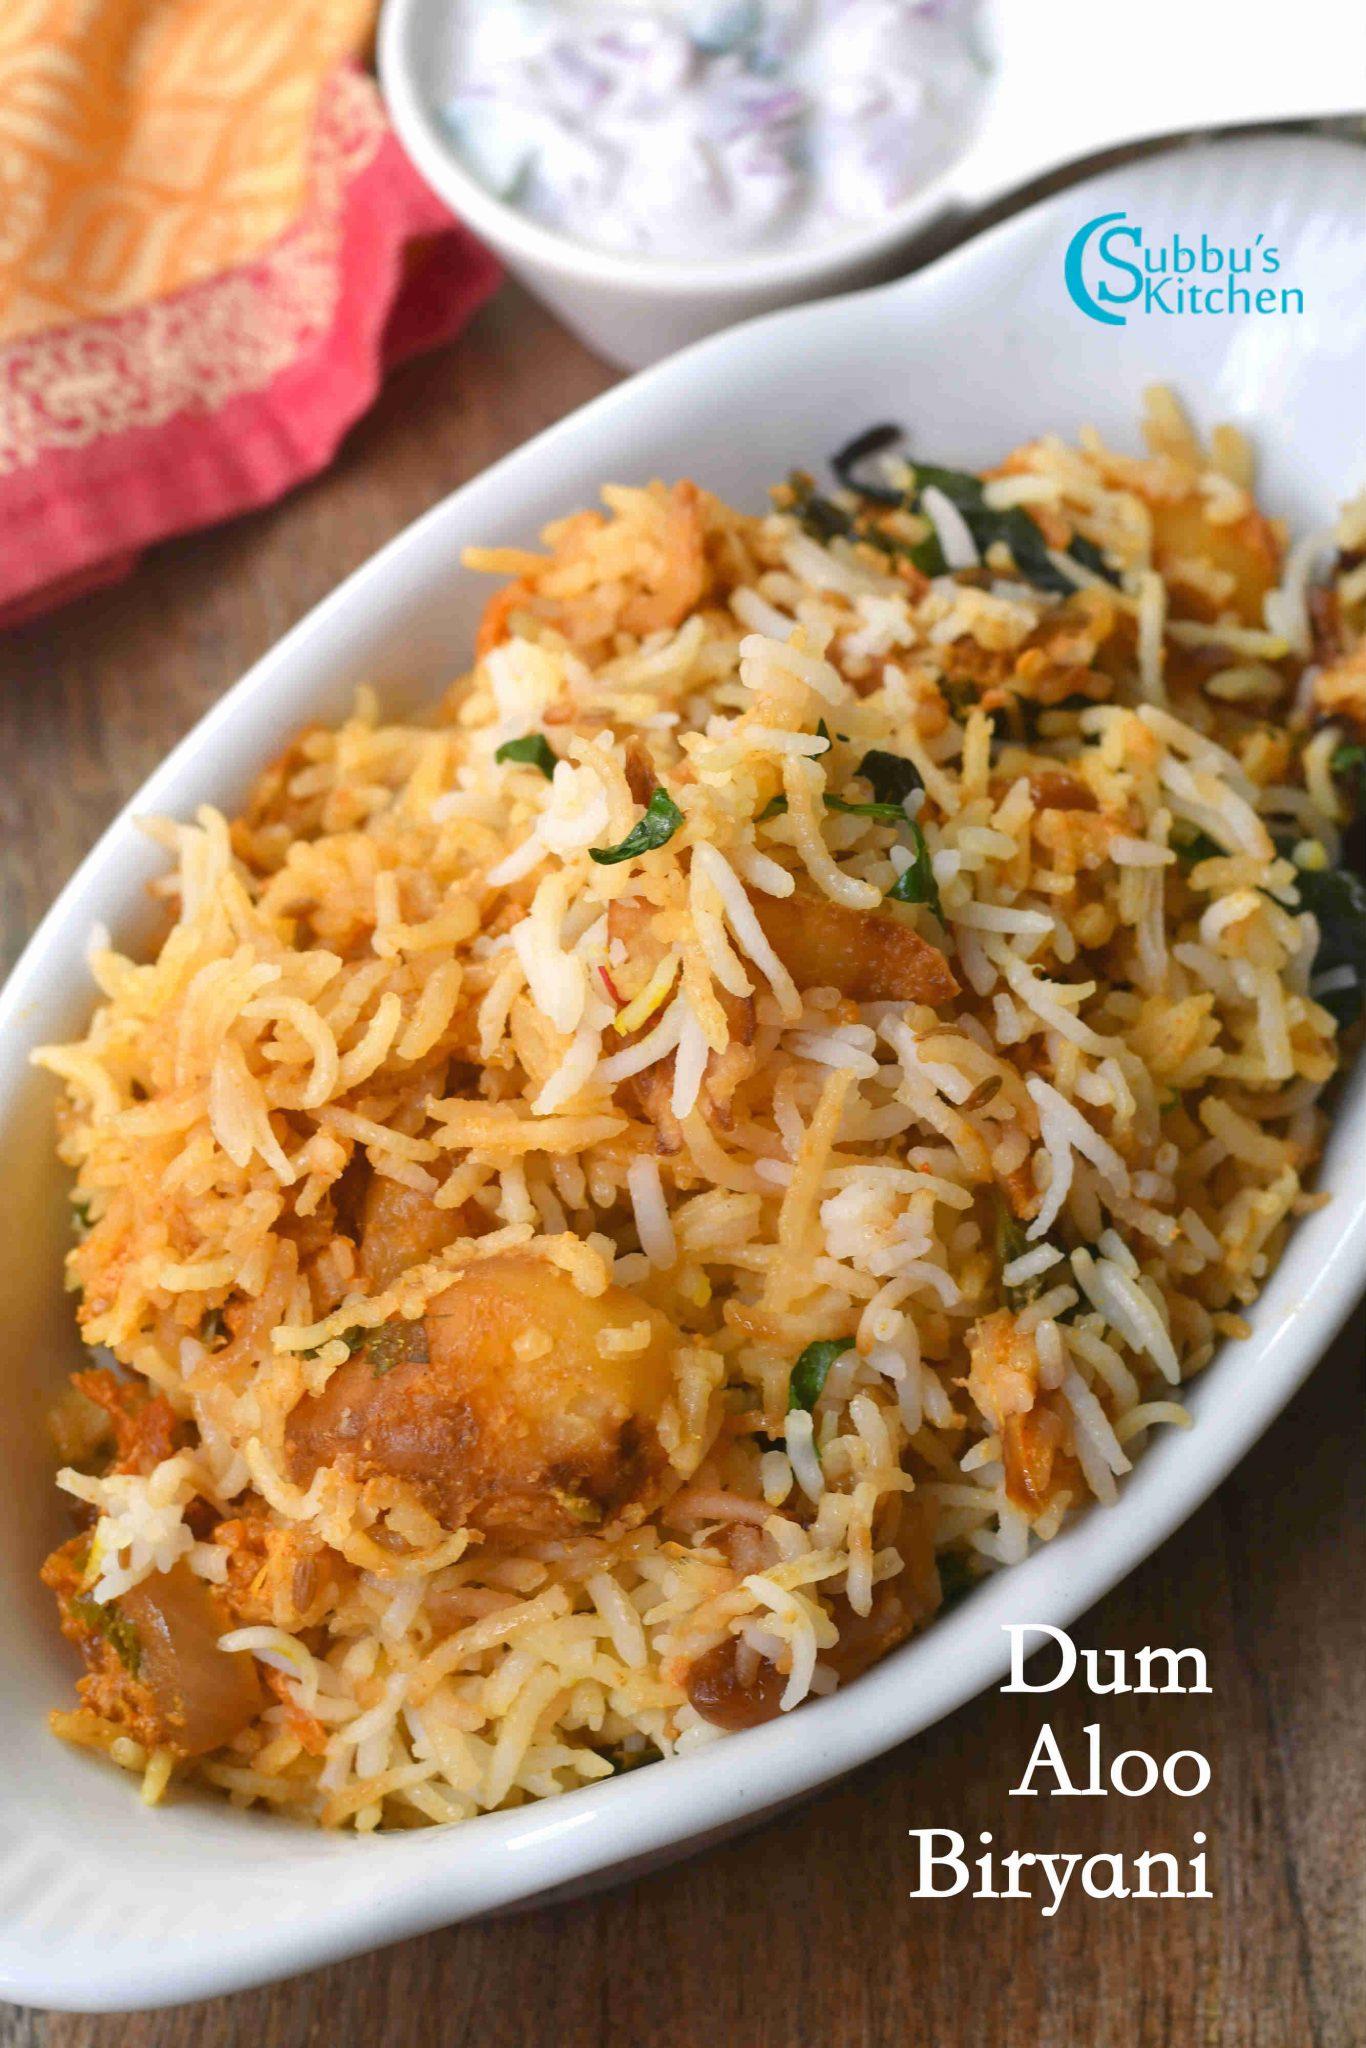 Aloo Dum Biryani | Dum Aloo Biryani Recipe - Subbus Kitchen